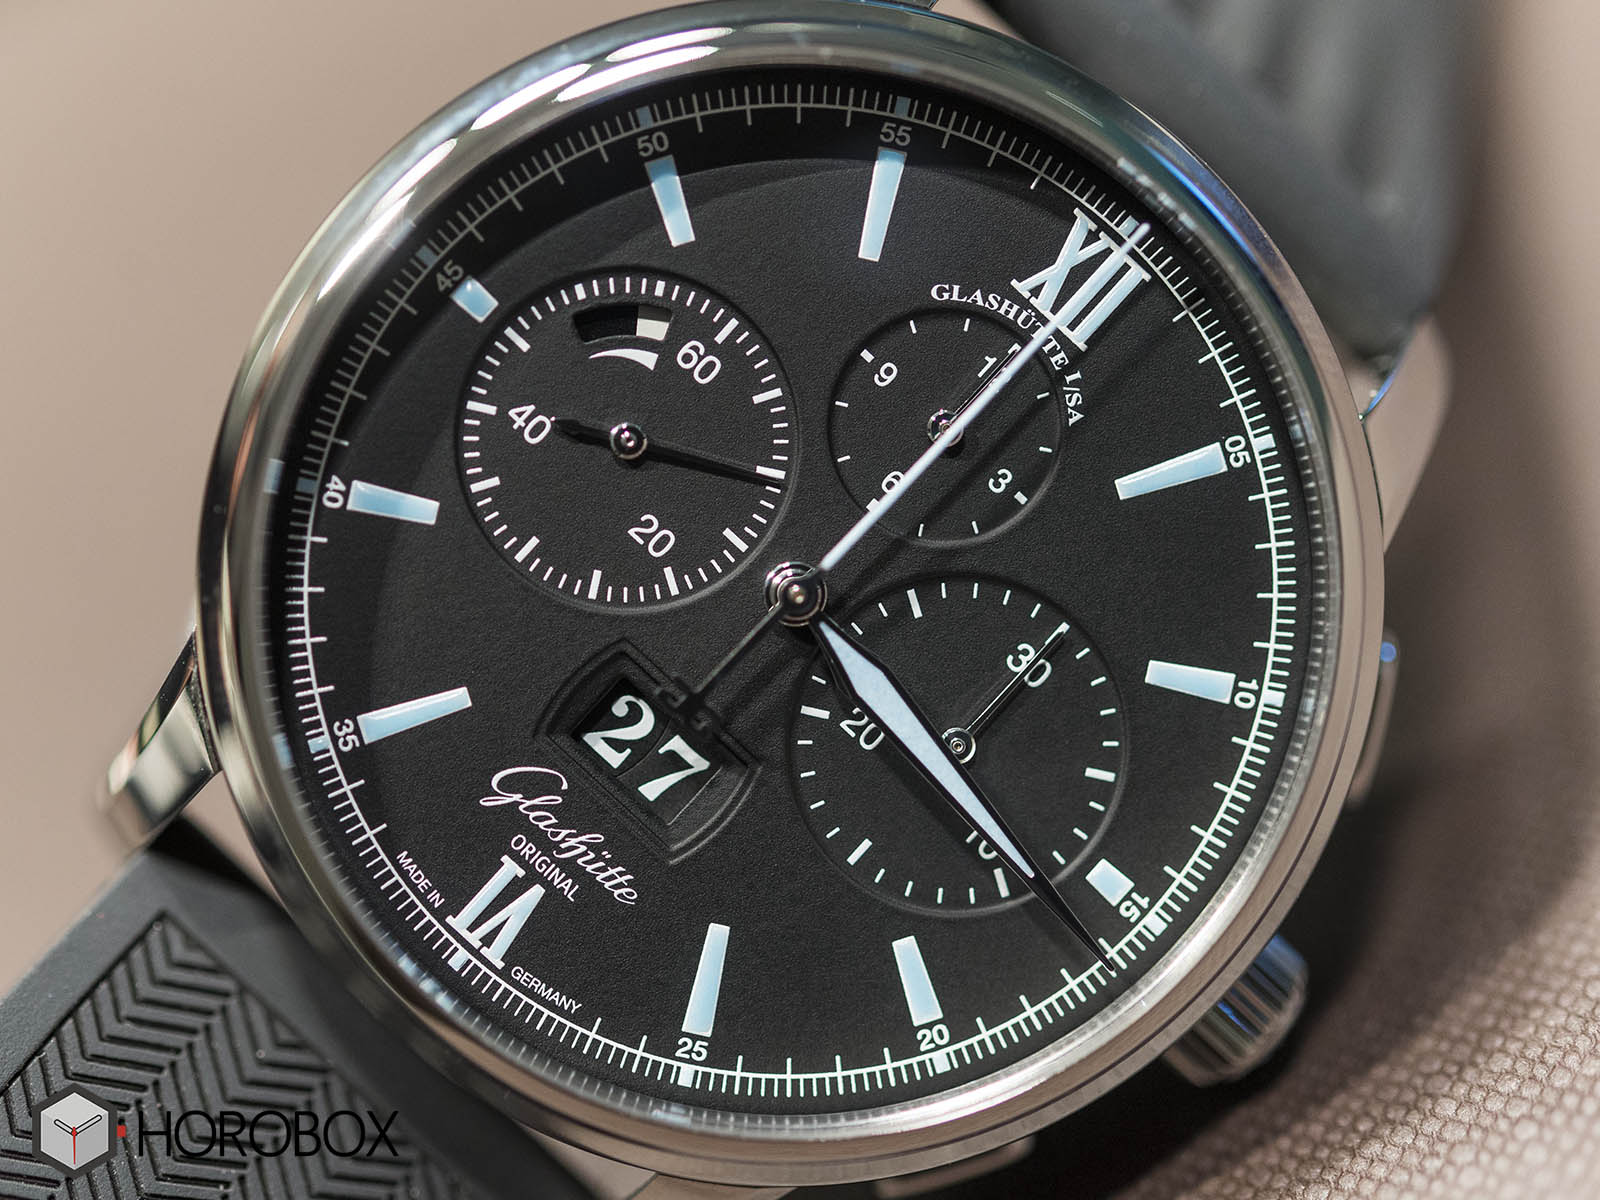 Glashu-tte-Original-Senator-Chronograph-